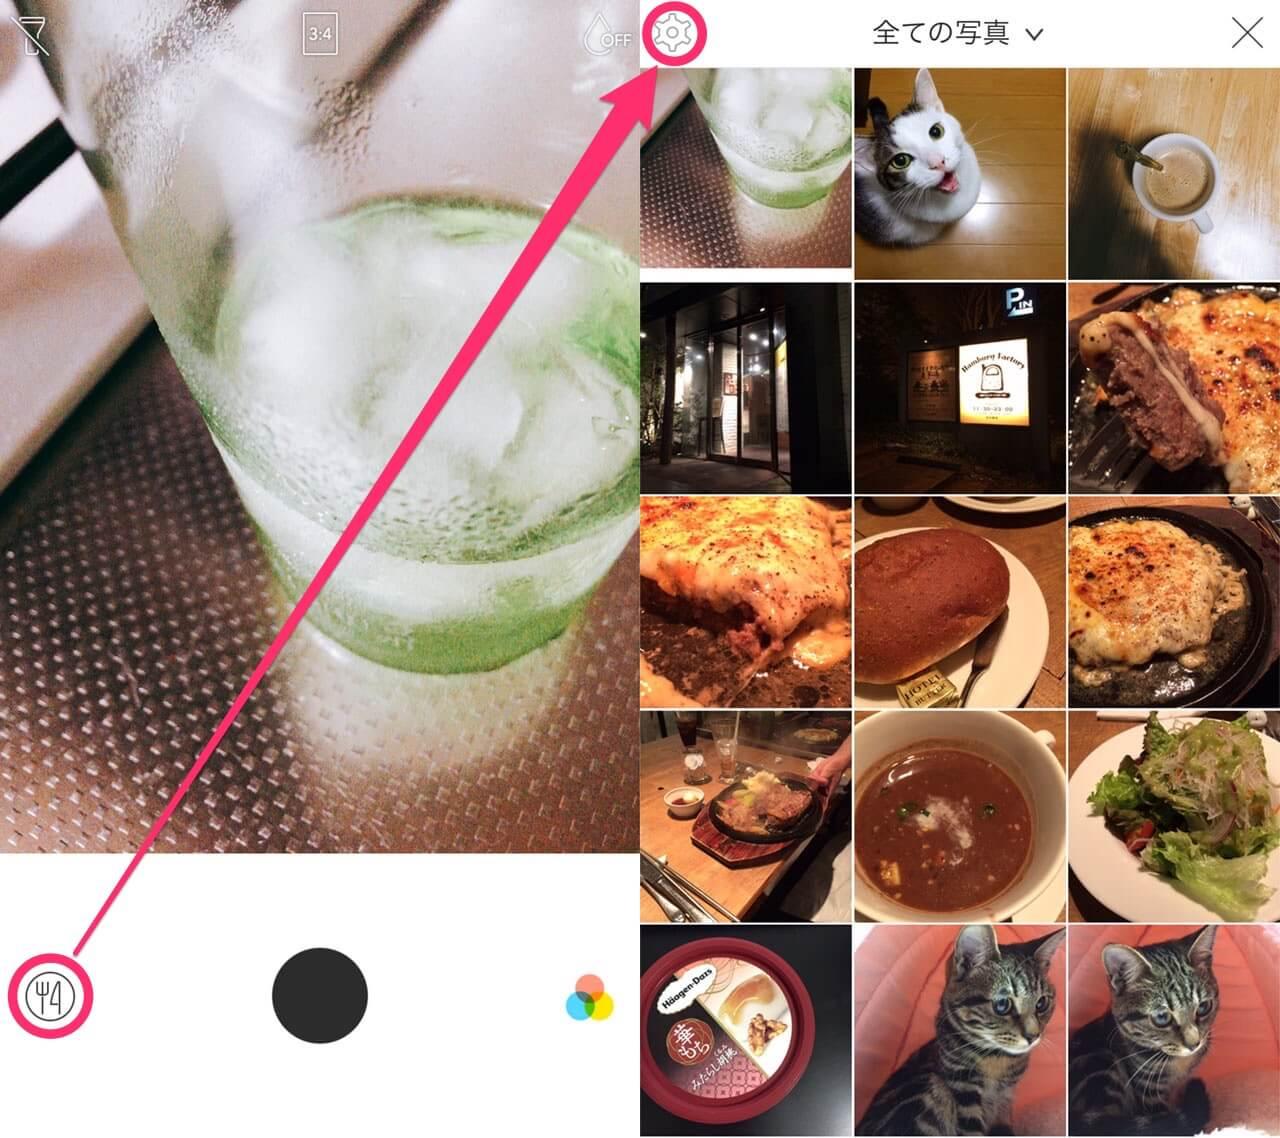 Foodie 設定画面の開き方